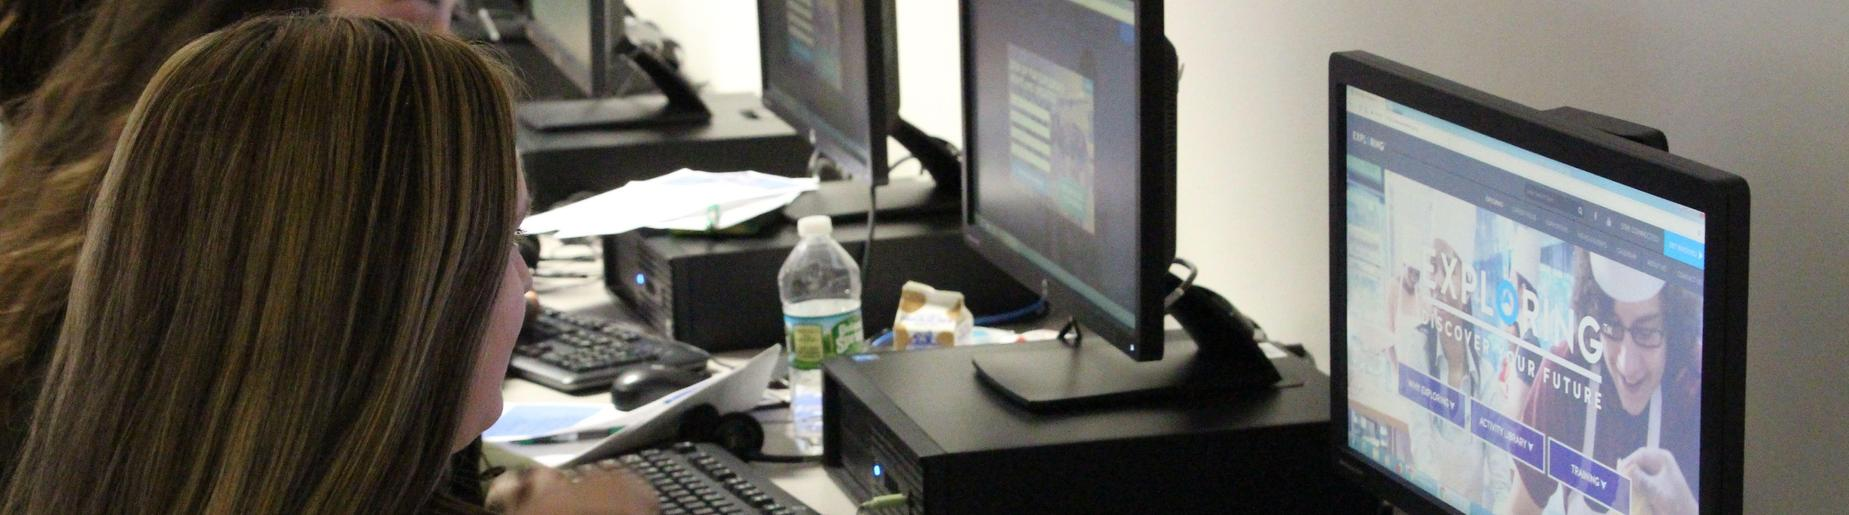 student at pc looking at exploring their future